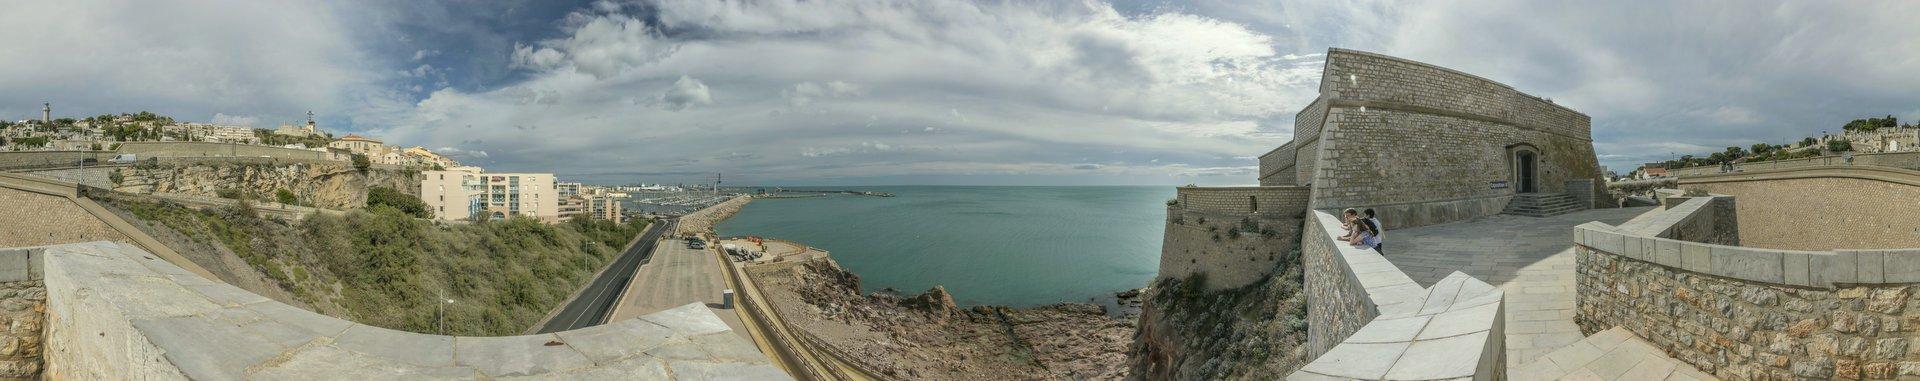 360° Panorama am Théâtre de la Mer in Sète